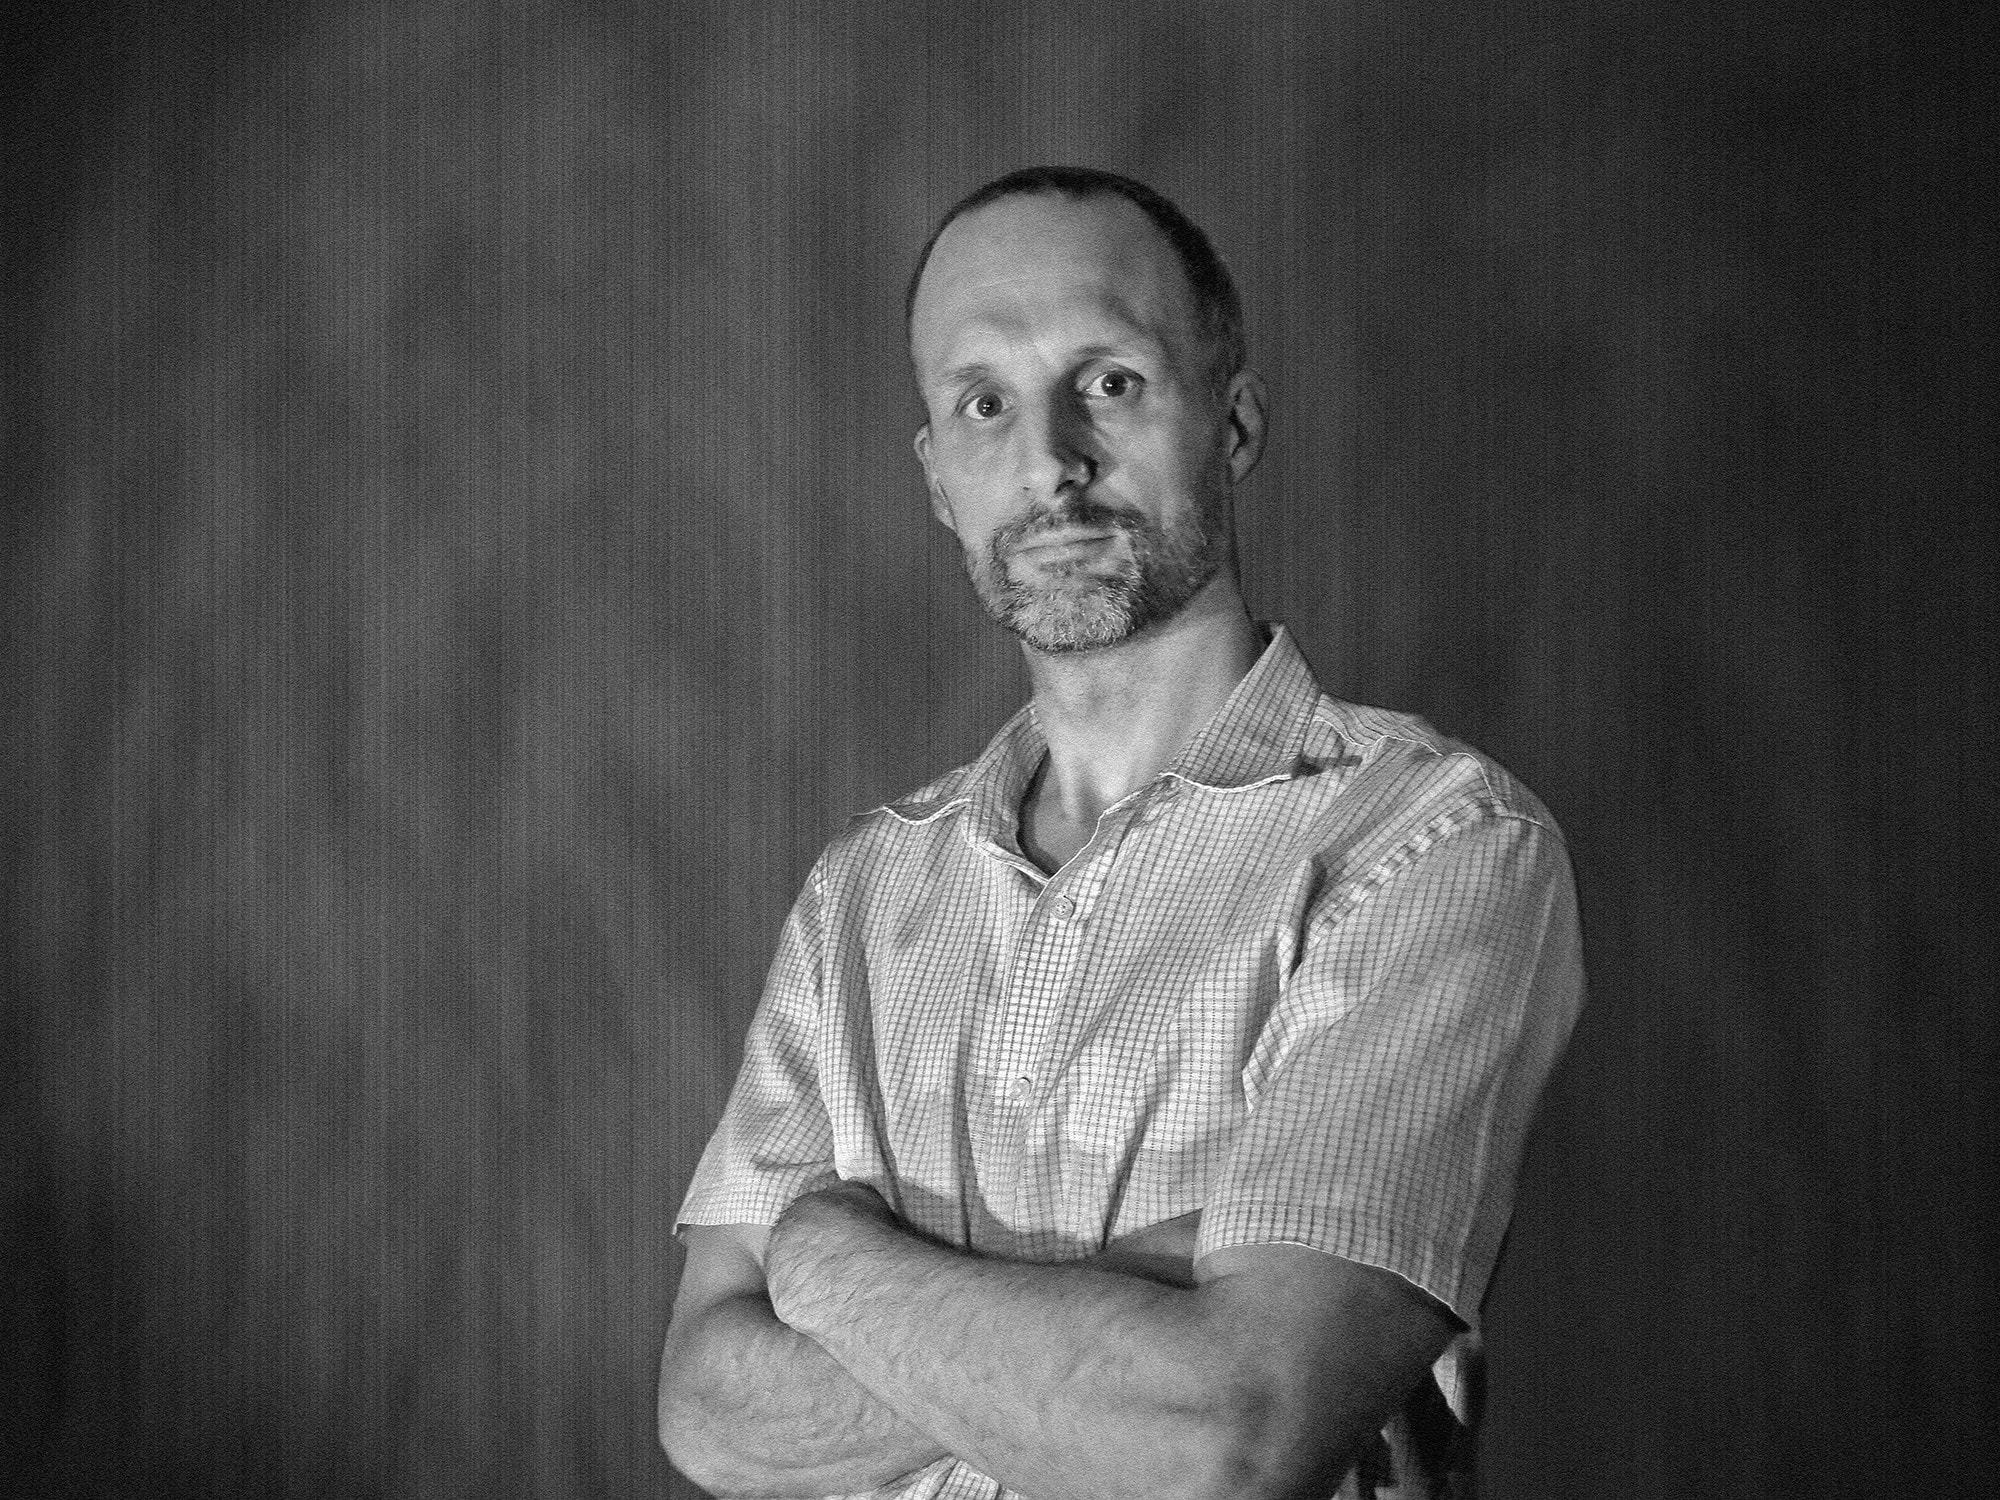 Neil Rhodes - A Photo Restoration Artist and Photo Retoucher